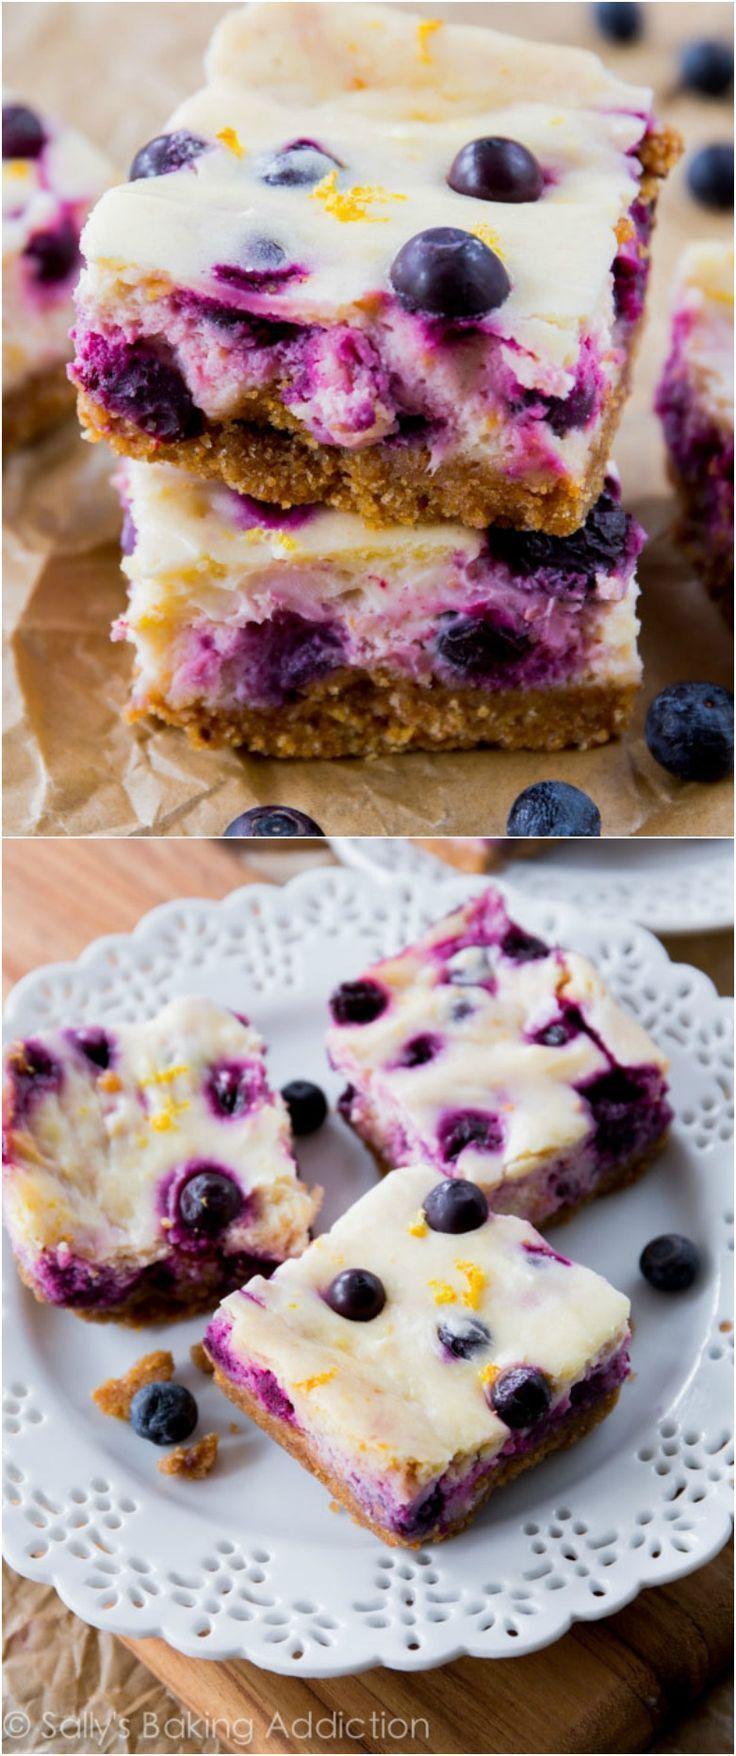 Creamy lemon cheesecake bars Creamy lemon cheesecake bars dotted and swirled with juicy blueberries